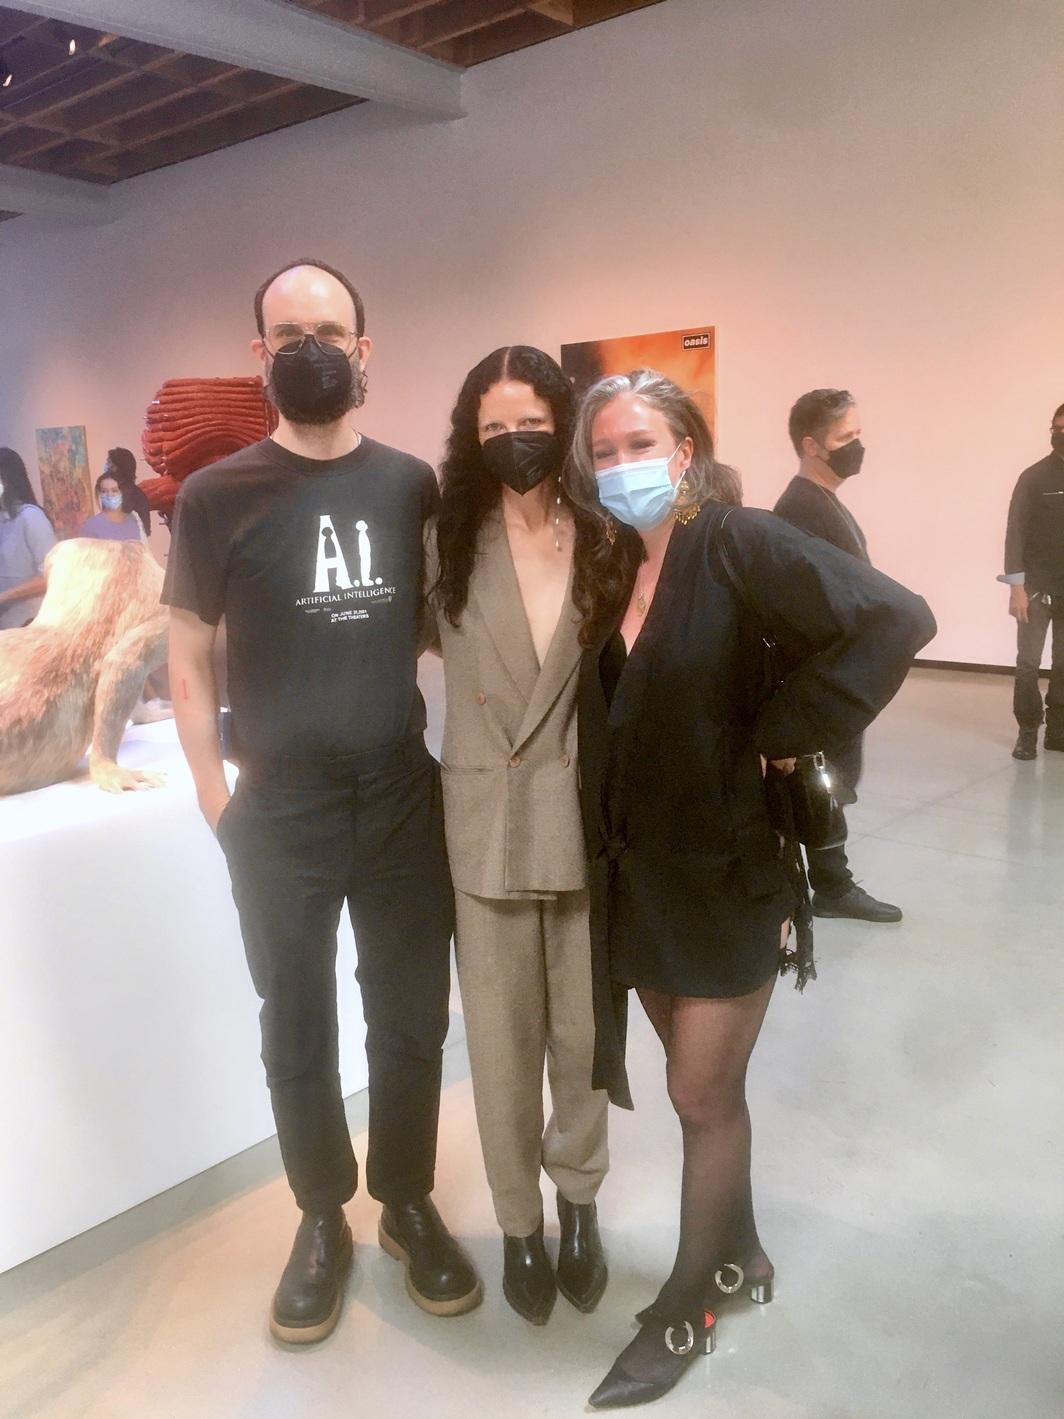 Artists Jon Ray, Isabelle Albuquerque, and Ambera Wellmann. Photo: Chloe Wyma.